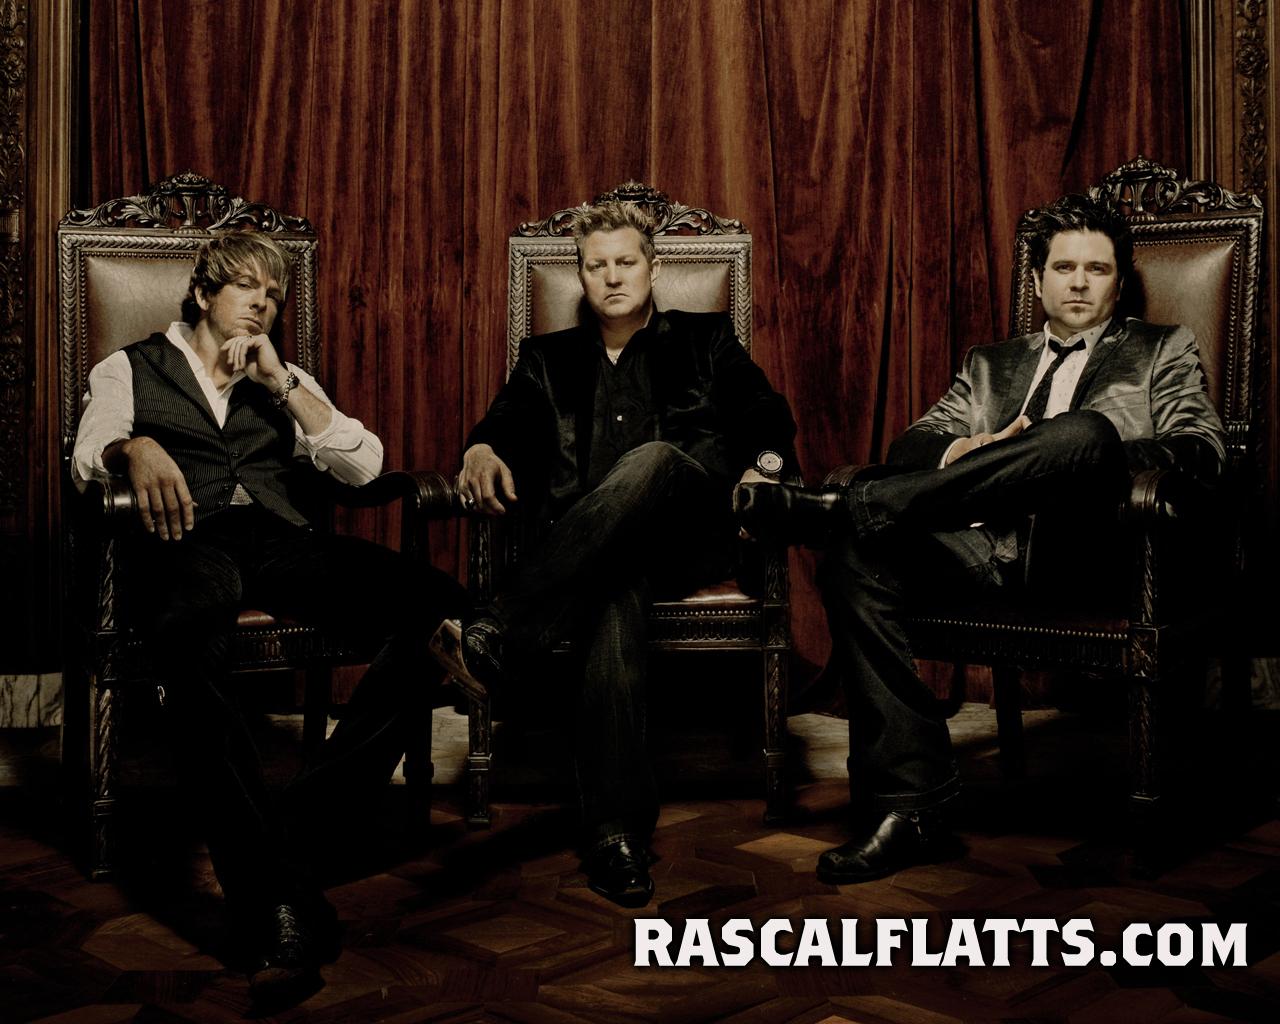 Rascal Flatts Unstoppable wallpaper   Rascal Flatts Wallpaper 1280x1024